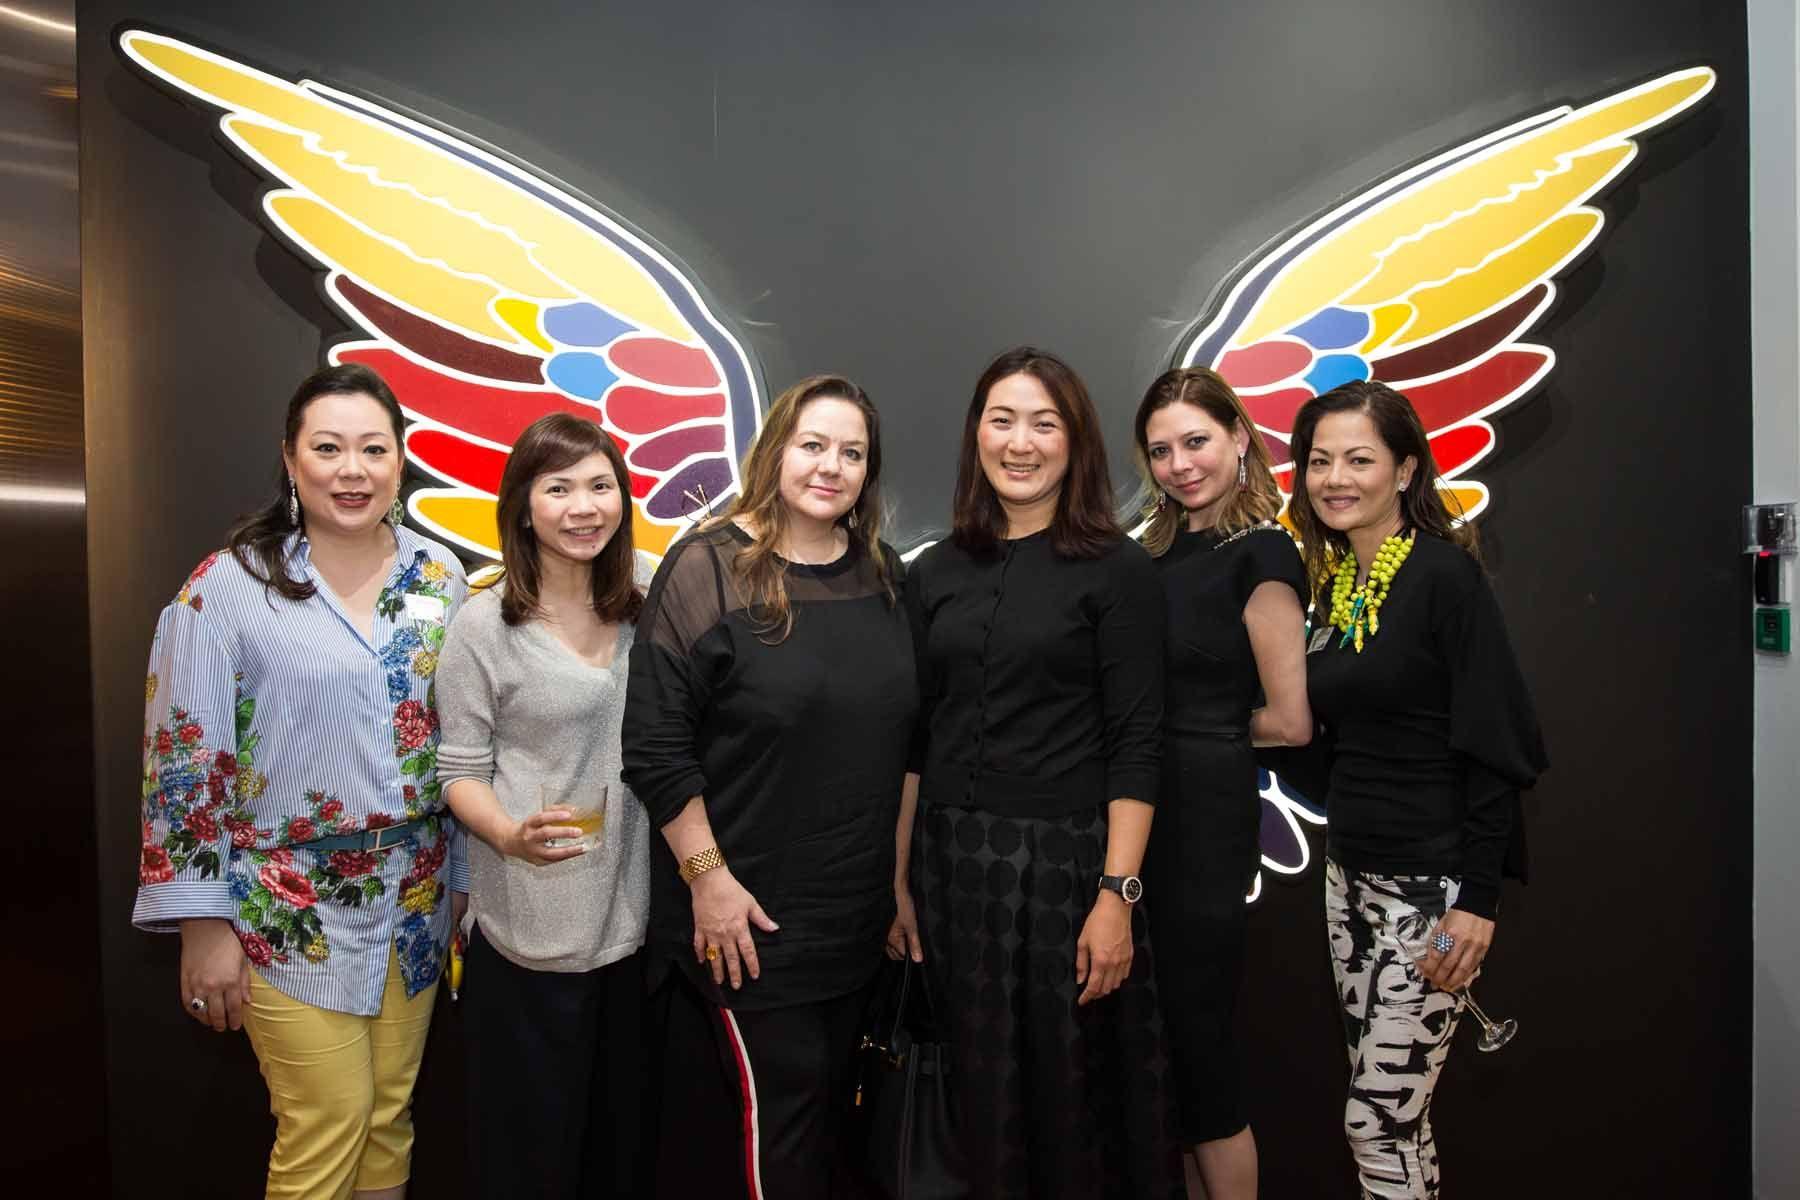 Cheryl Lee, Shirley Crystal Chua, Elena Iwatake, Nana Au-Chua, Marisa Hjelle Chan, Suguna Madhavan